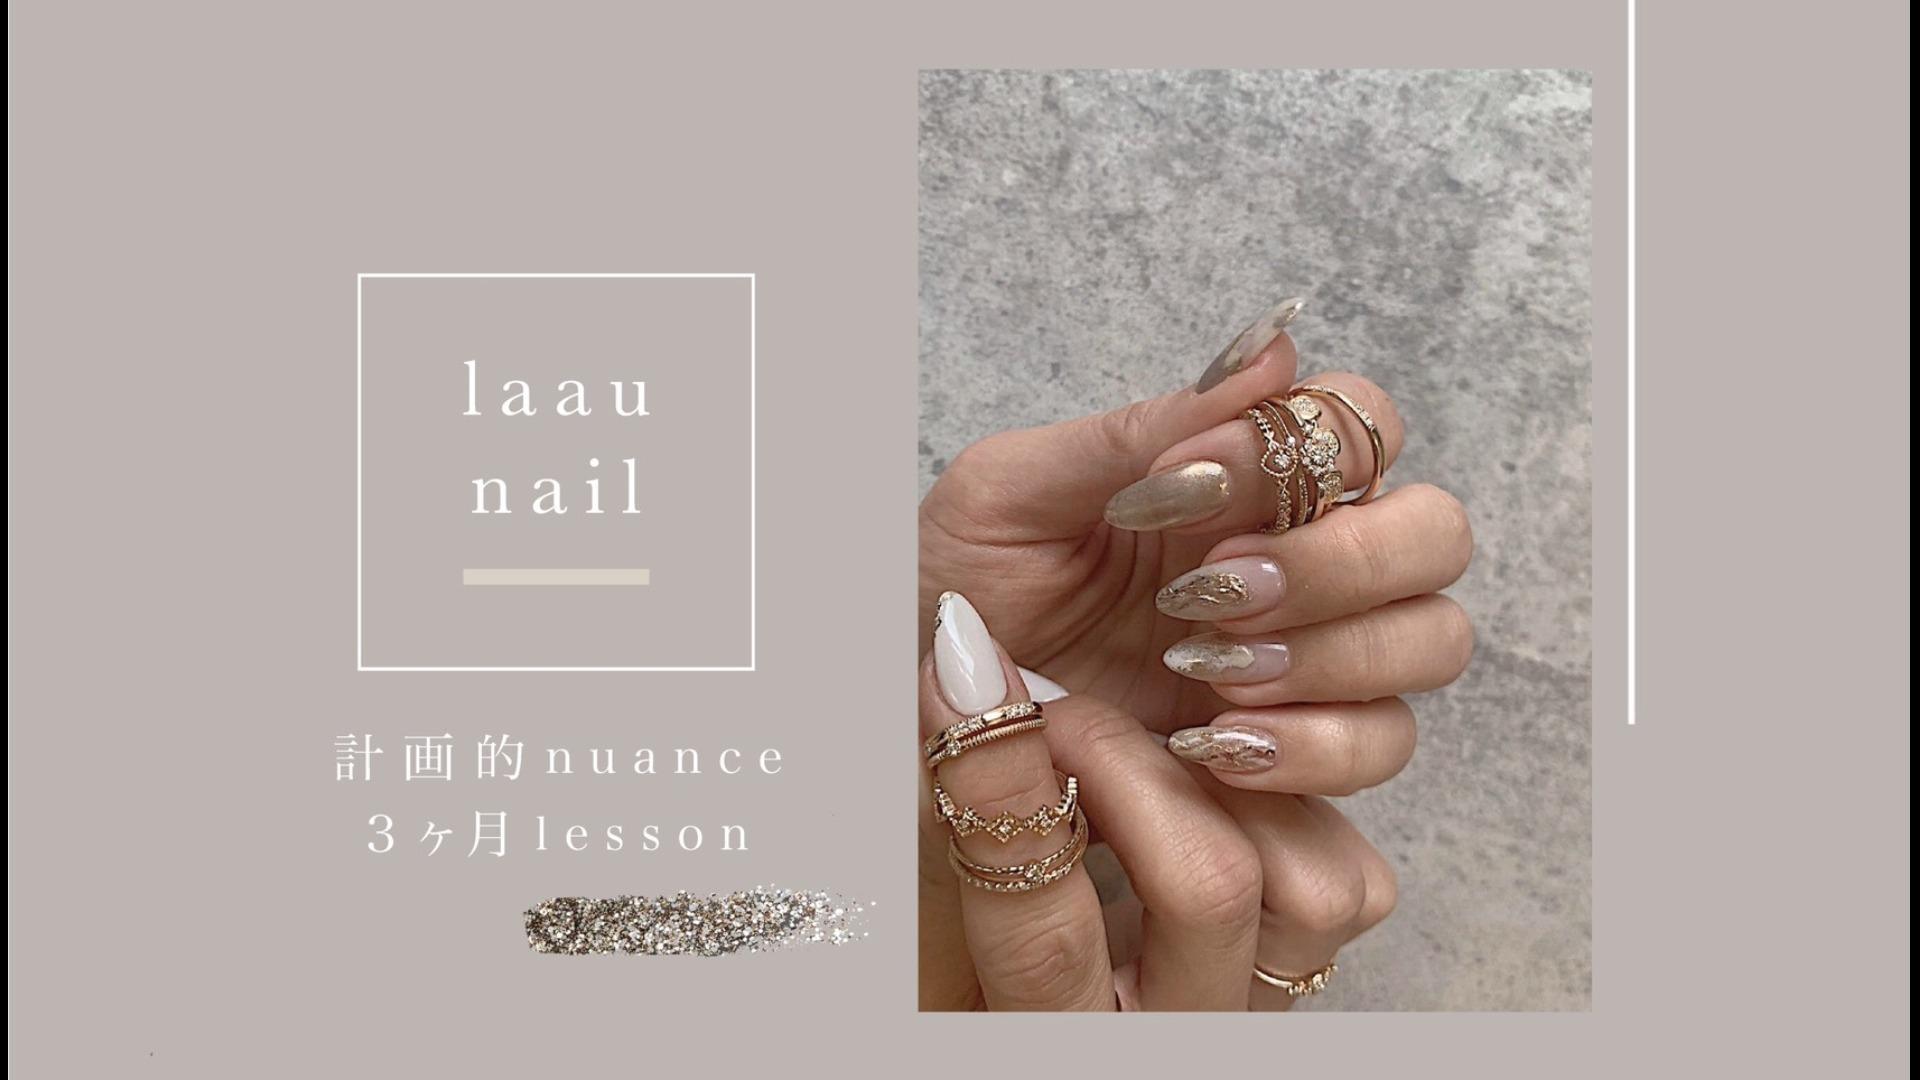 laau nail 計画的nuance 3ヶ月lesson